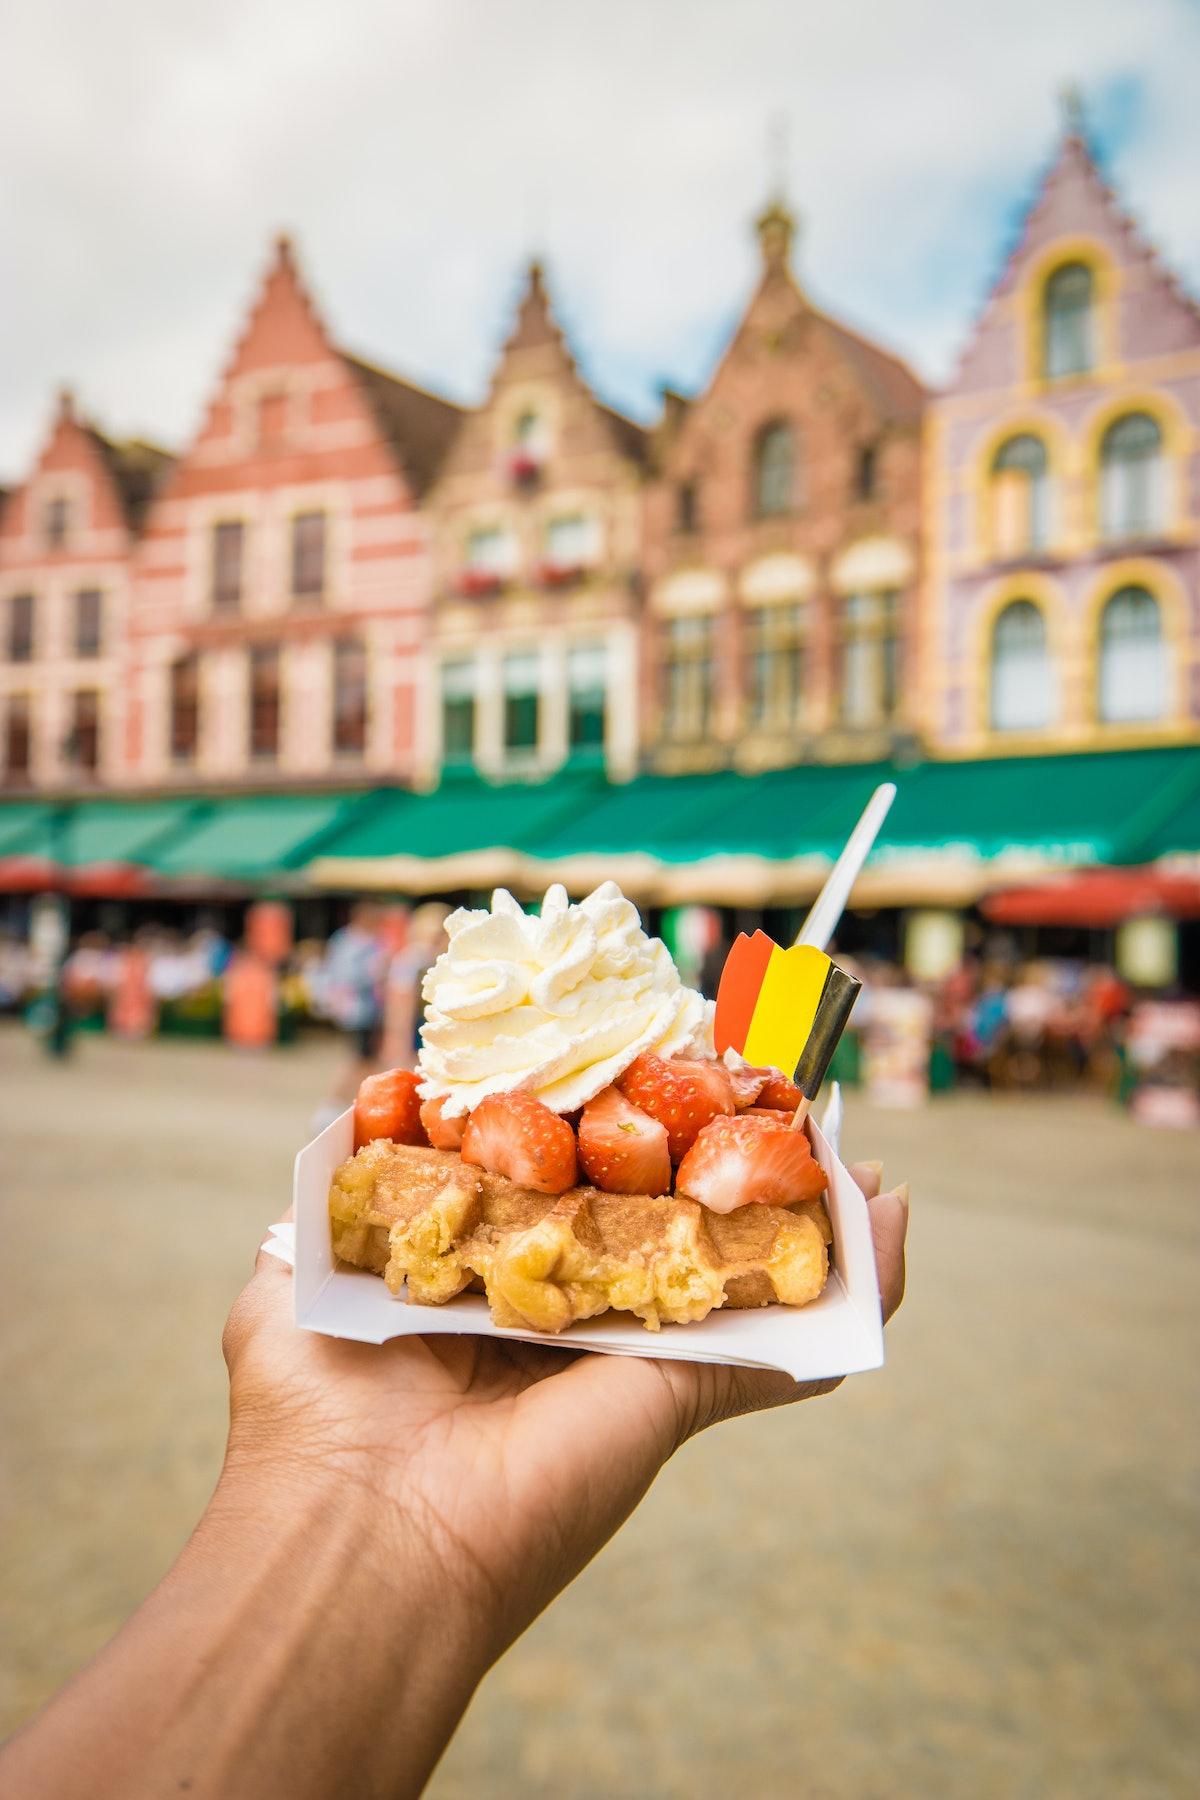 Brugge waffles Belgium, Waffle with cream and strawberry